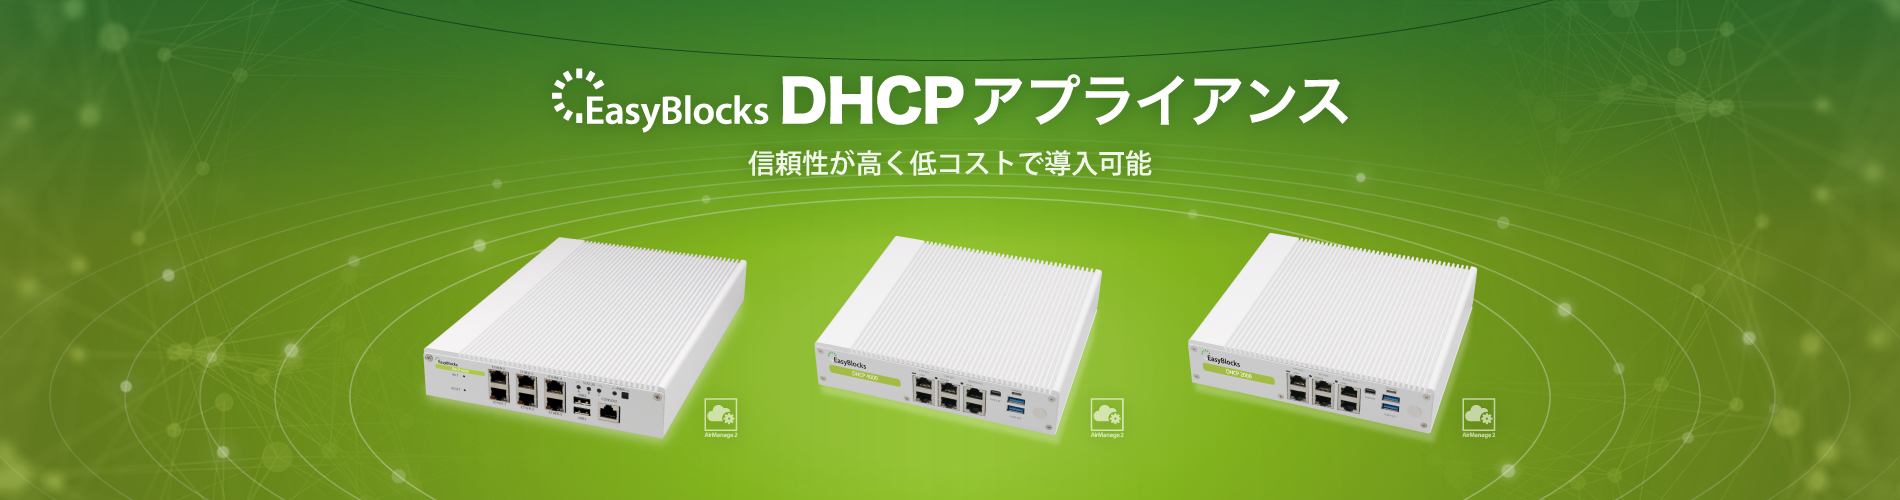 EasyBlocks DHCPアプライアンス 信頼性が高く低コストで導入可能